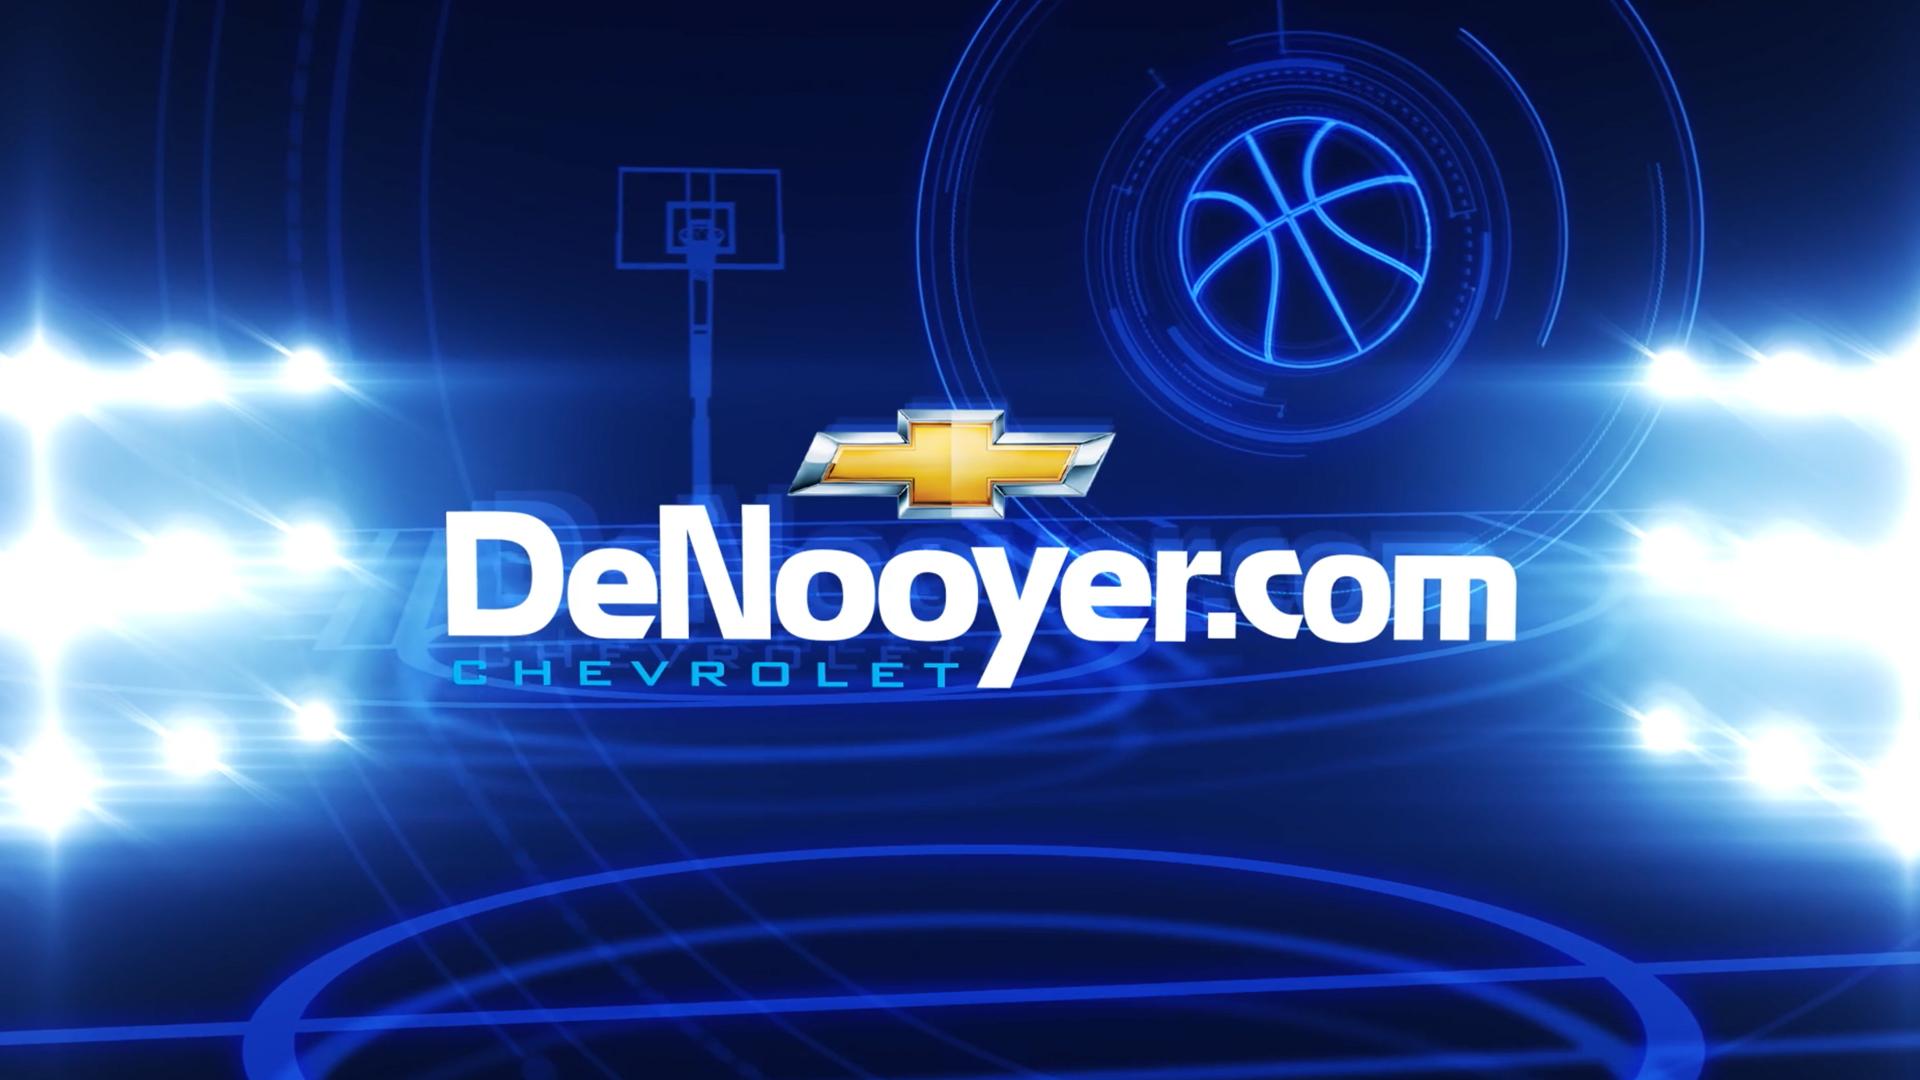 DeNooyer Chevrolet -